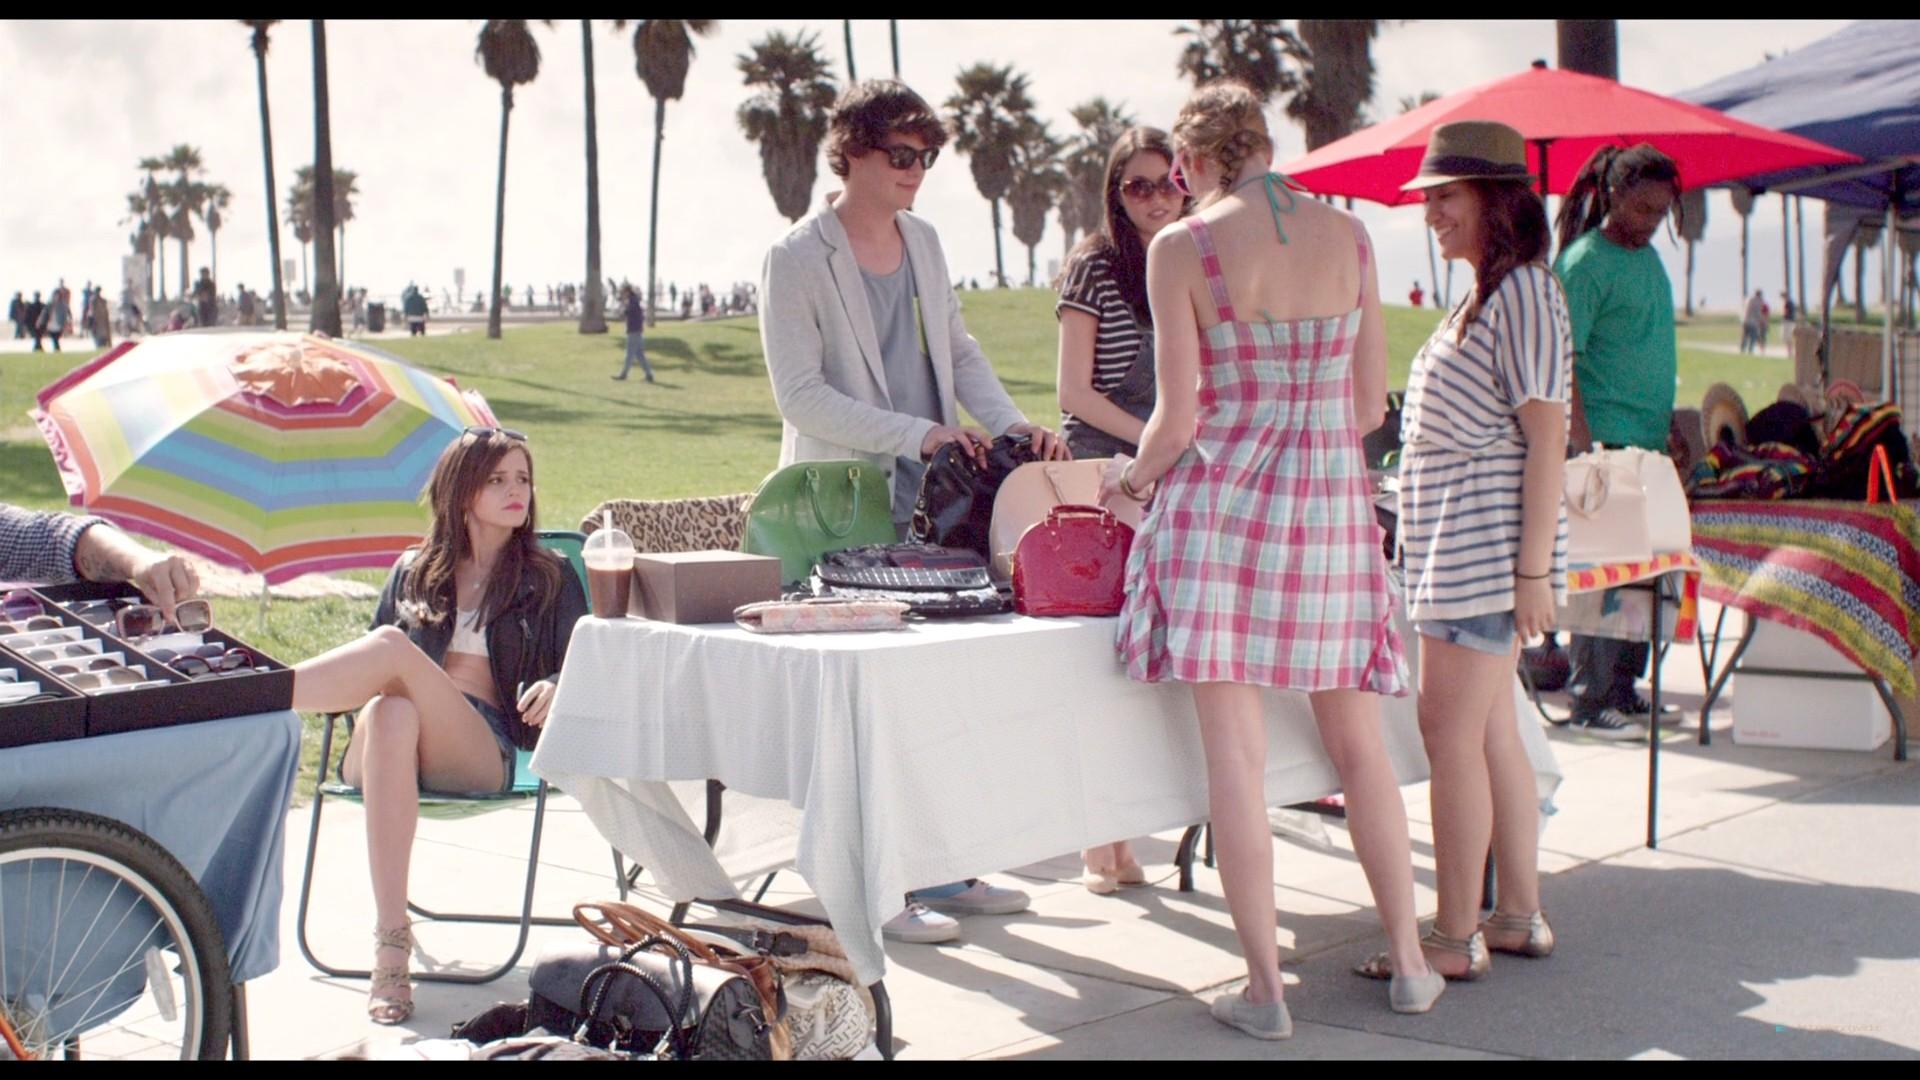 Emma Watson hot Taissa Farmiga and others sexy - The Bling Ring (2013) HD 1080p BluRay (8)